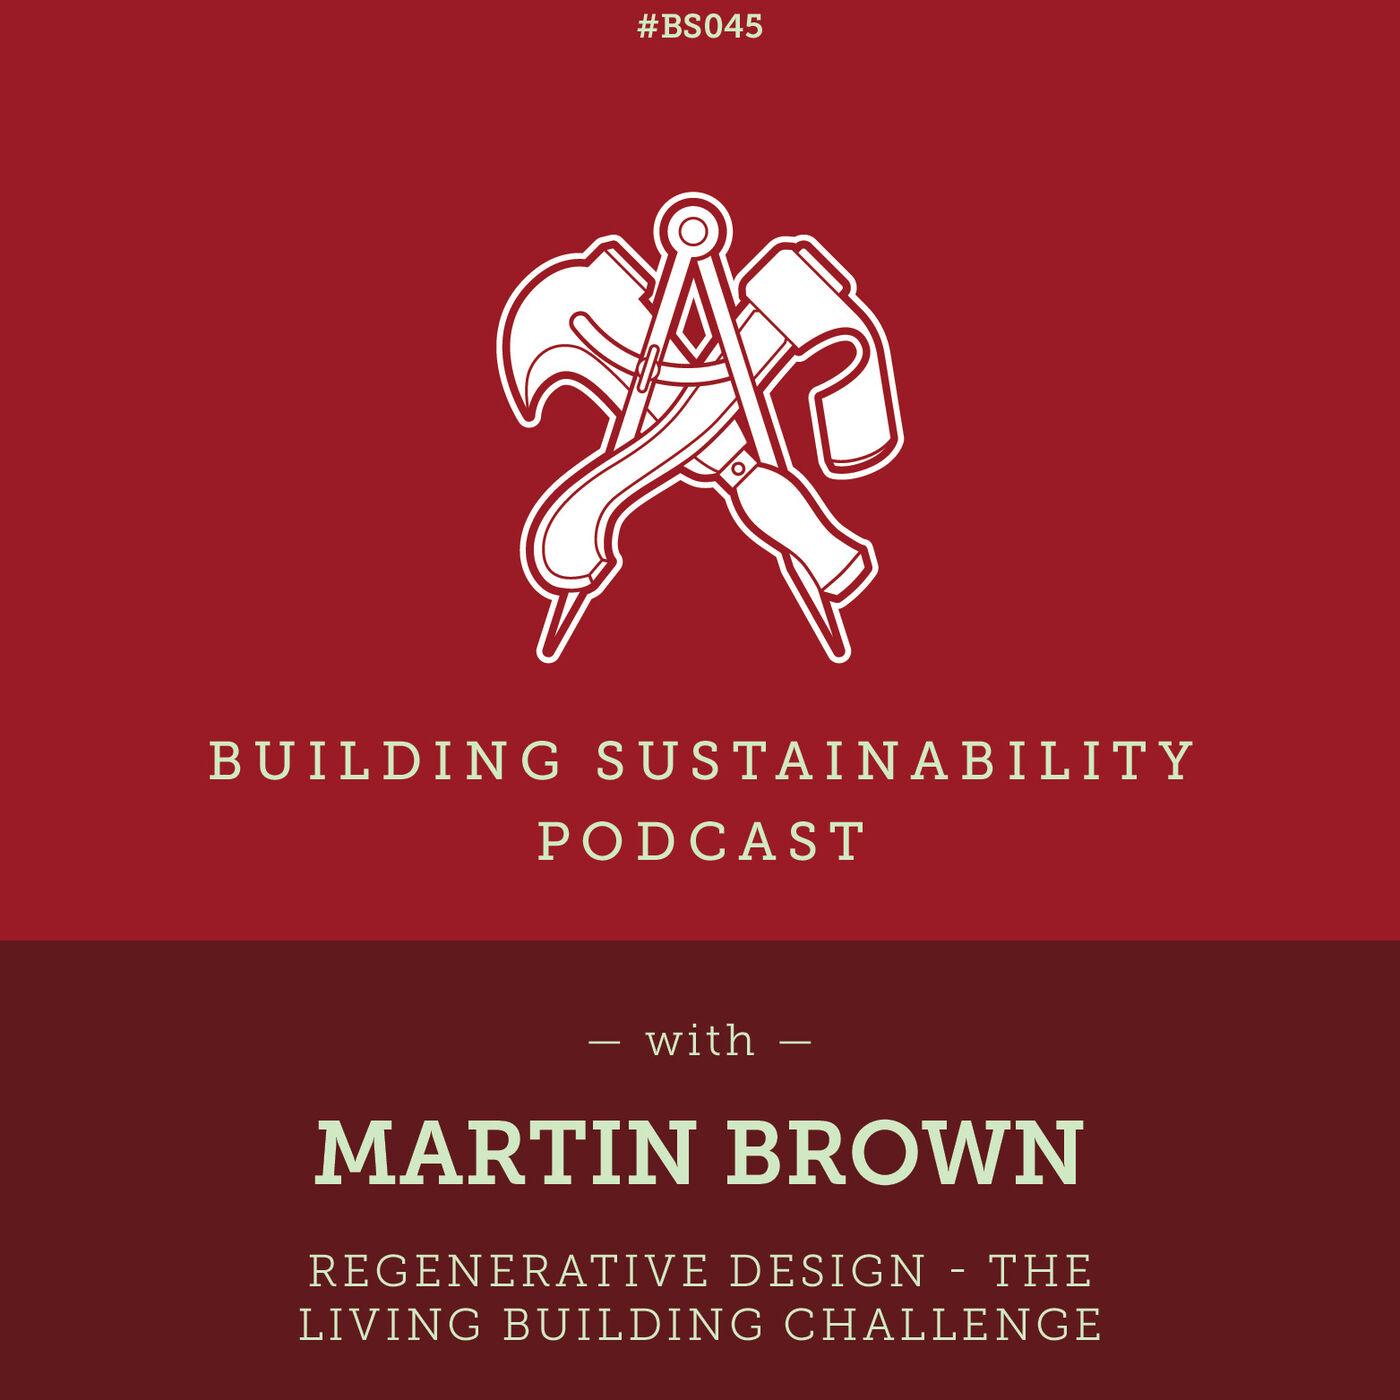 Regenerative Design - The Living Building Challenge - Martin Brown - BS045